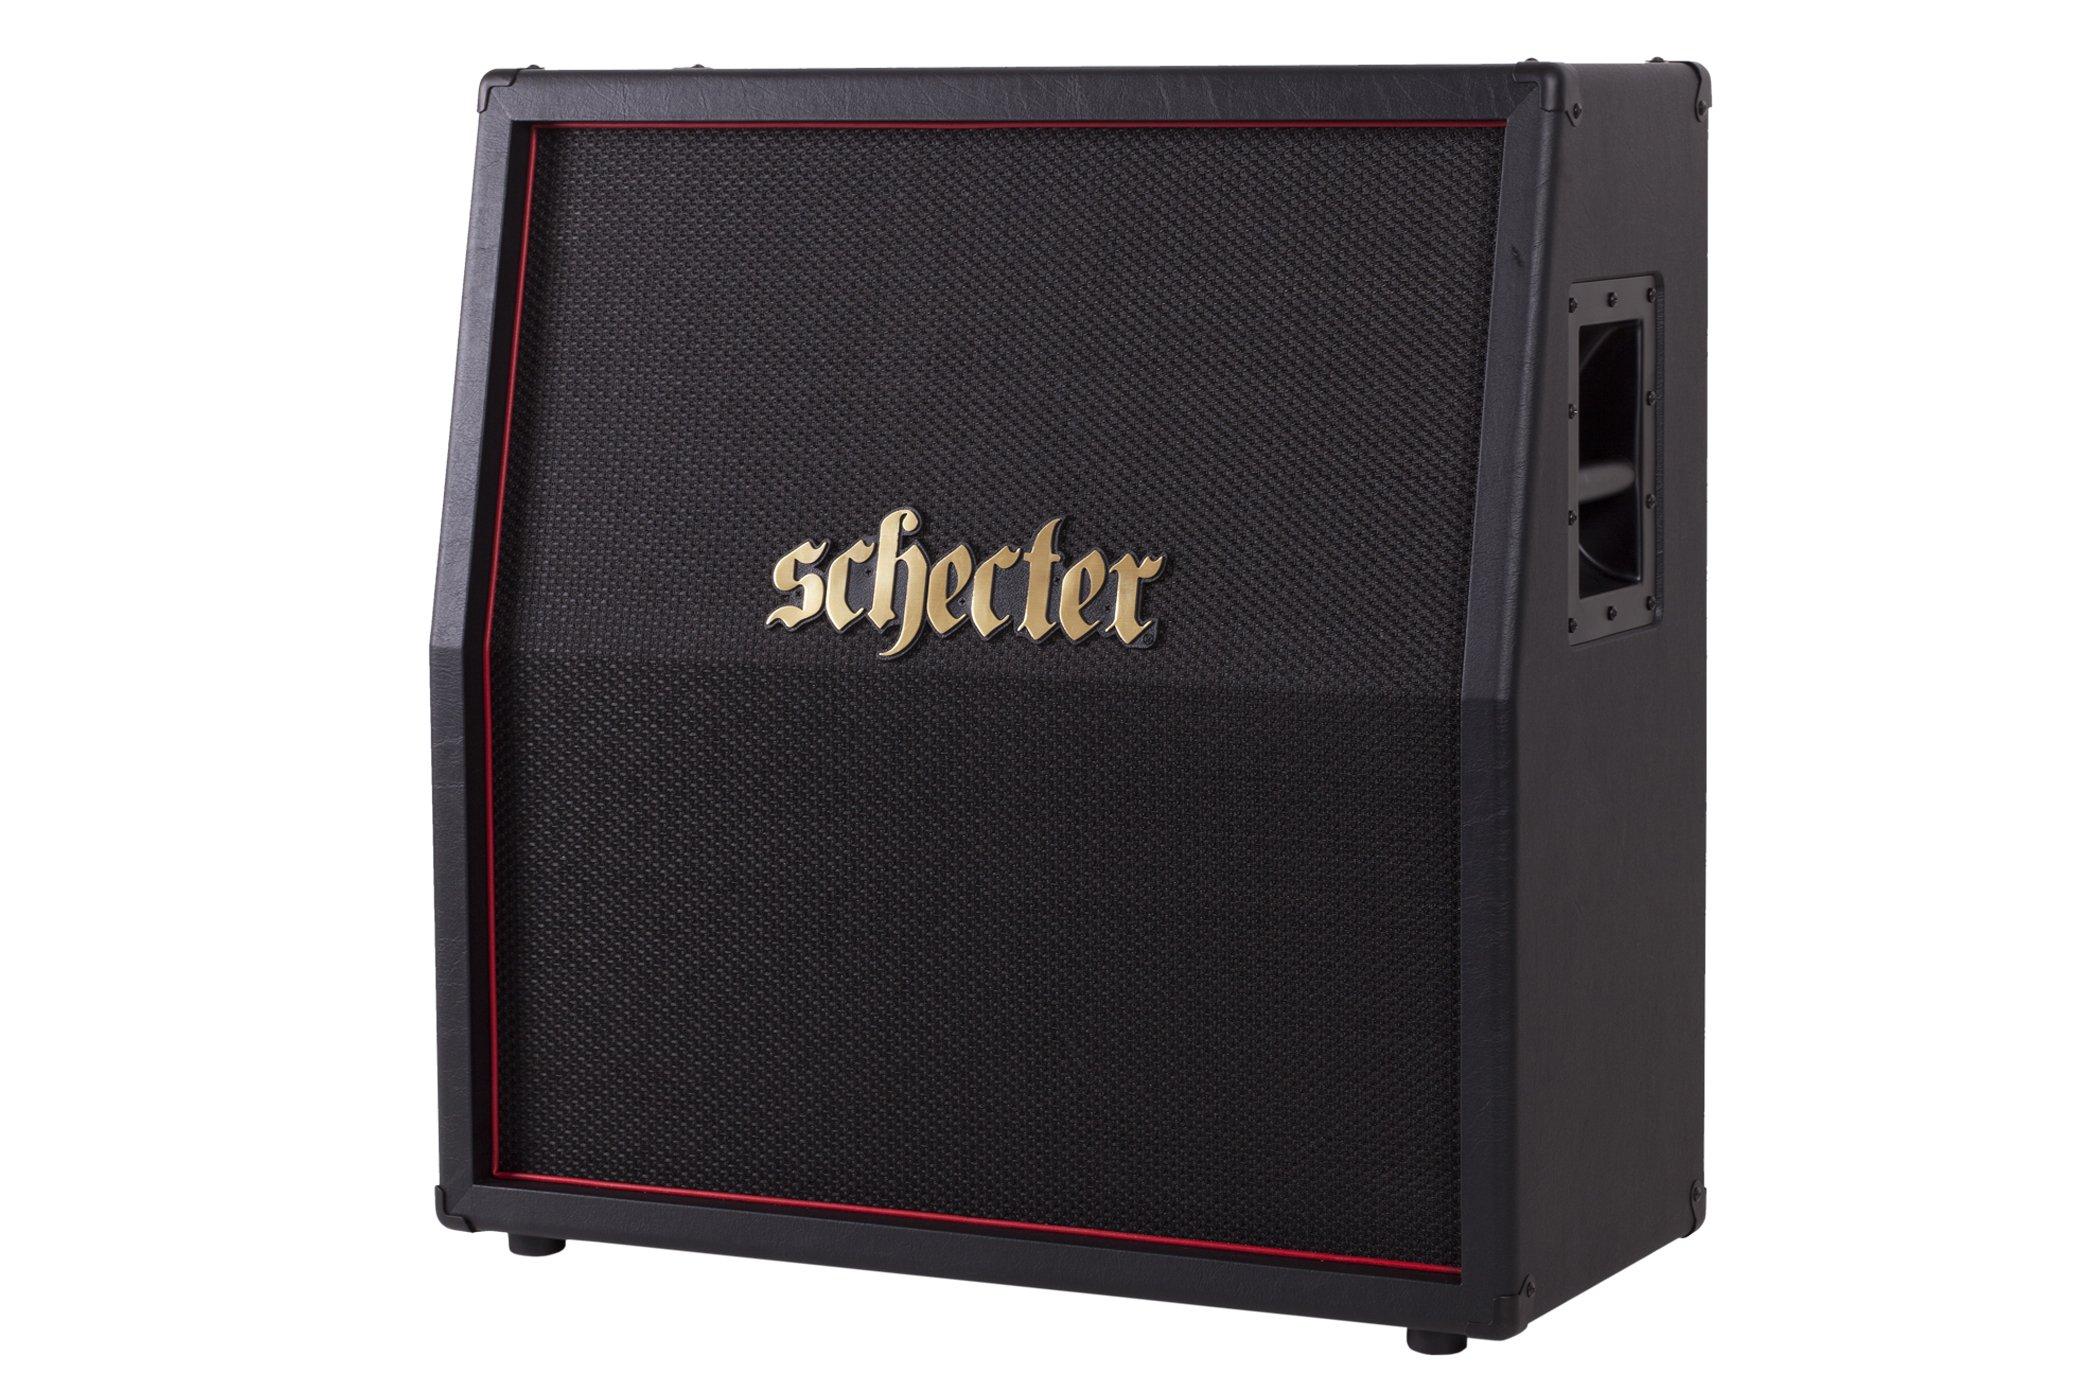 Schecter HR412-SLP1280E Hellraiser Deluxe Stage 4x12 Slant Cab